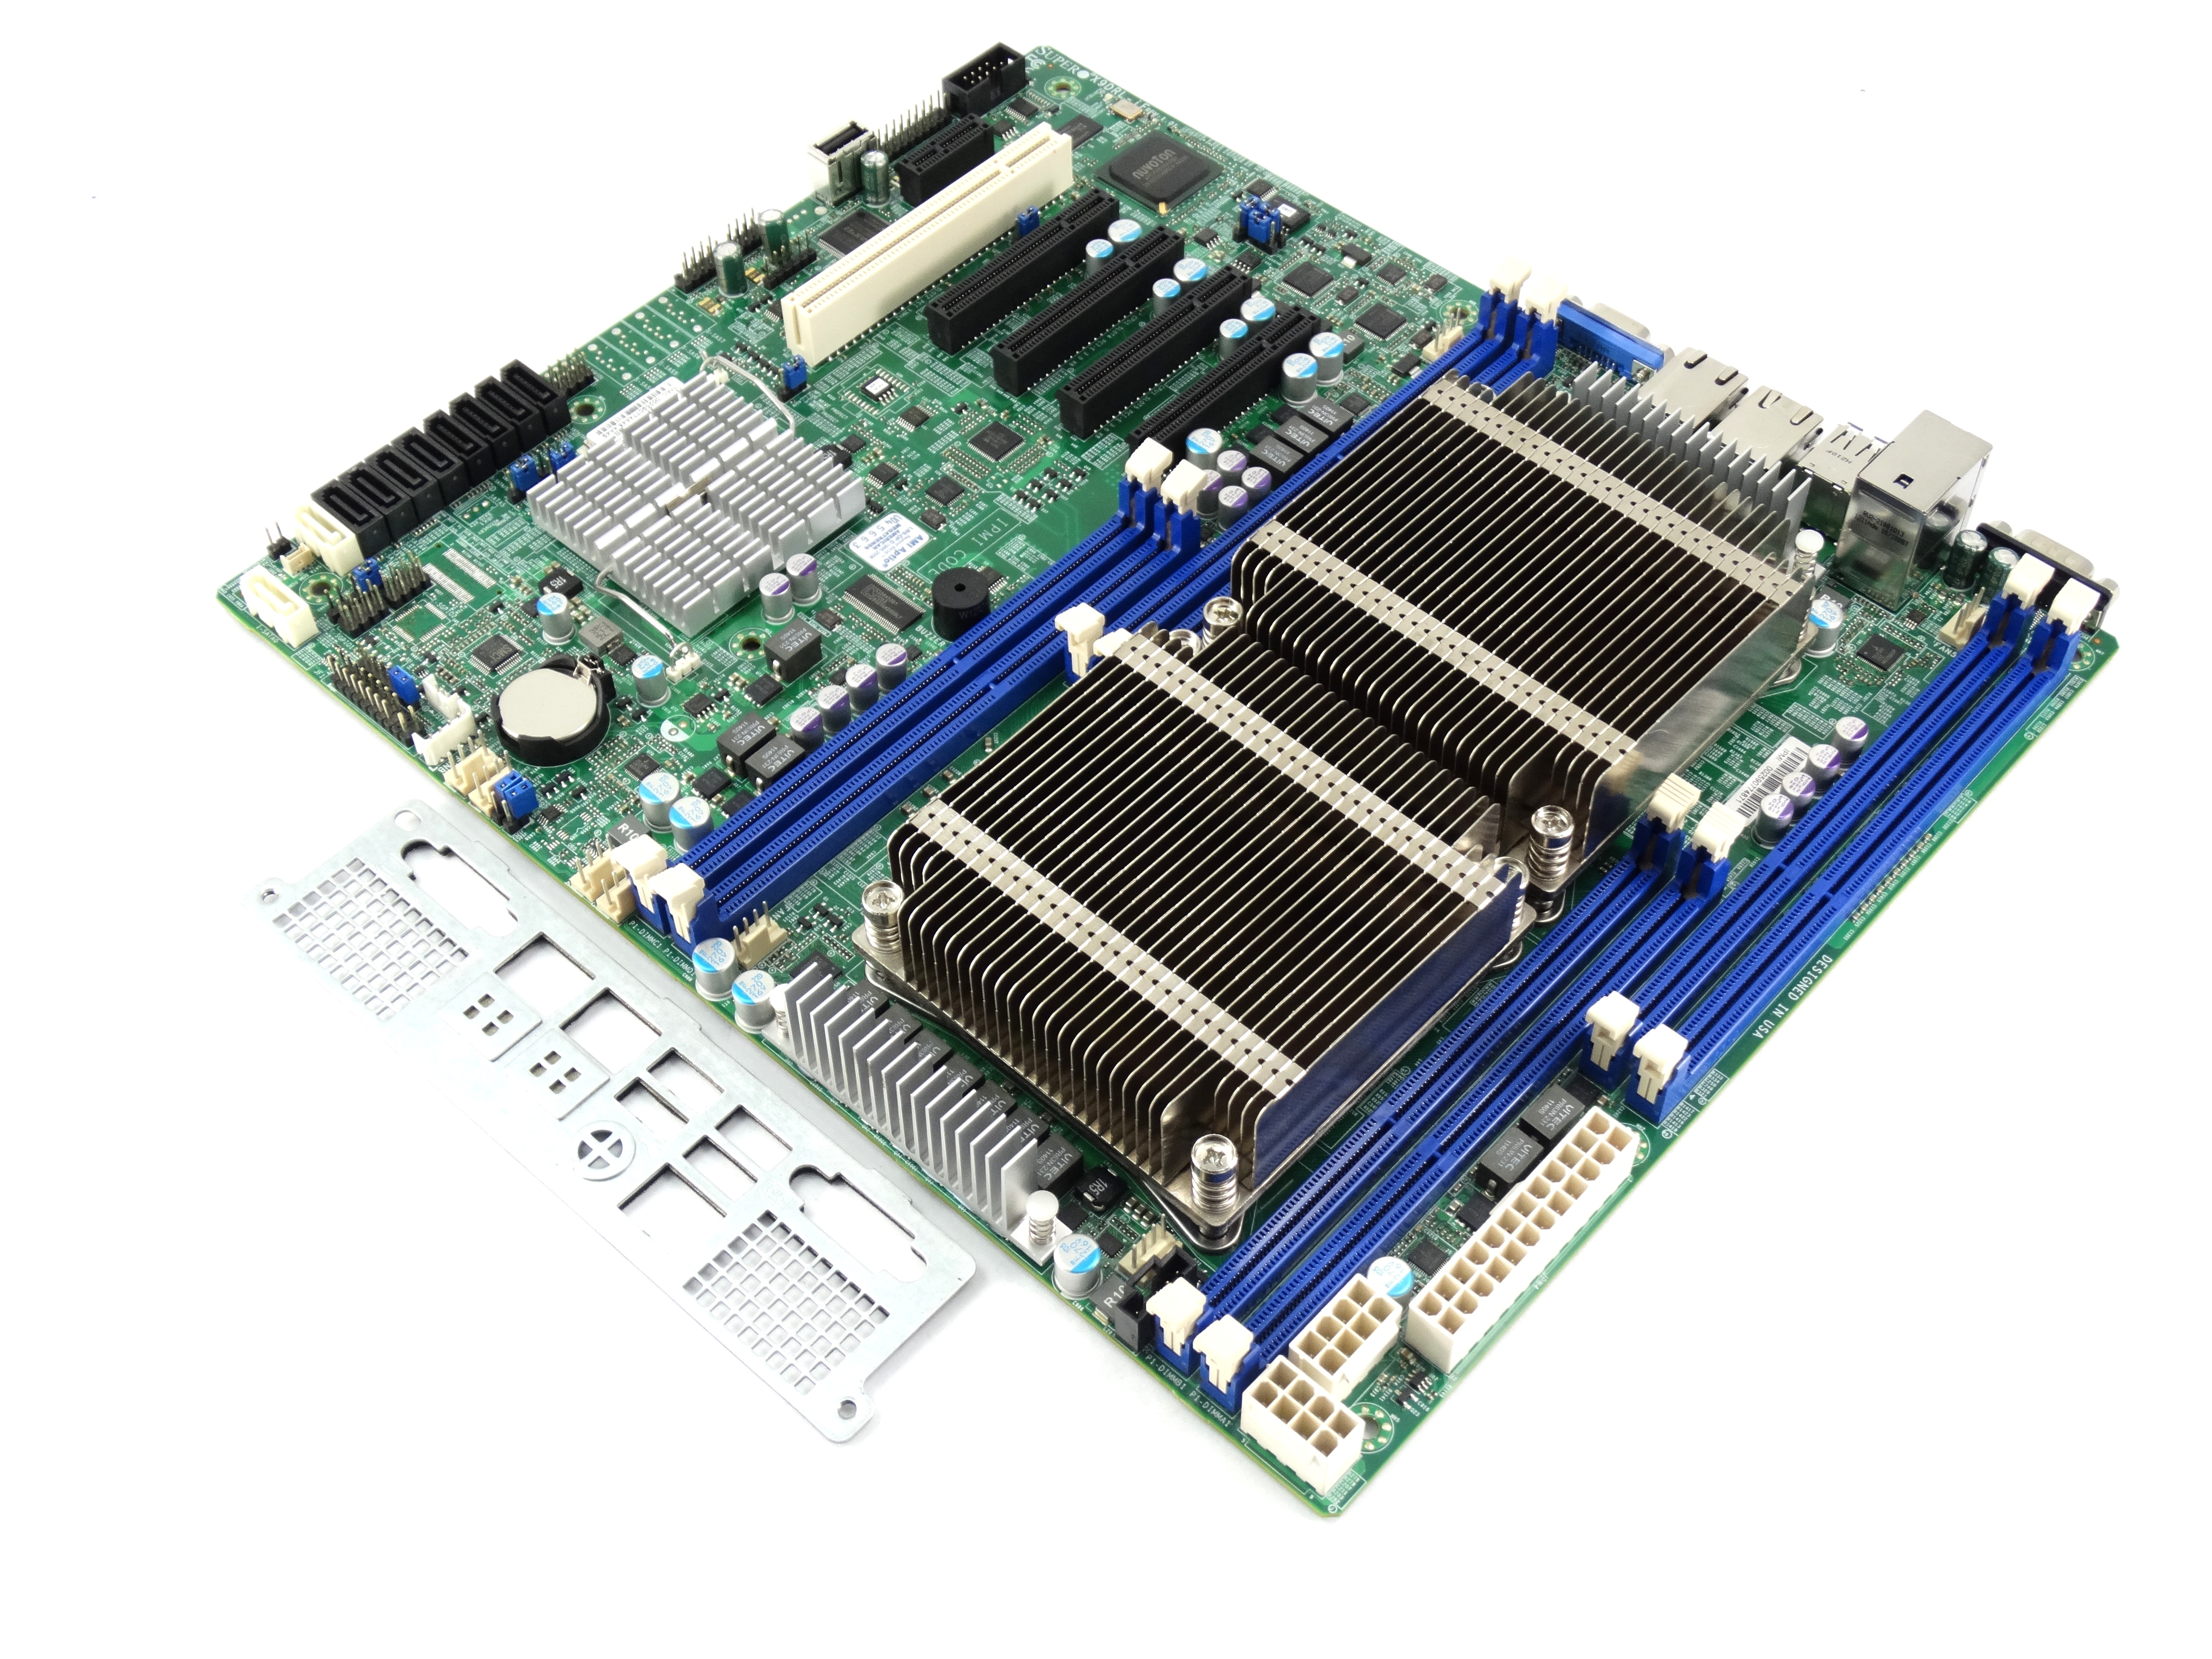 Supermicro Dual Intel Xeon E5-2600 v1/ v2 LGA2011 ATX Server Motherboard (X9DRL-IF)